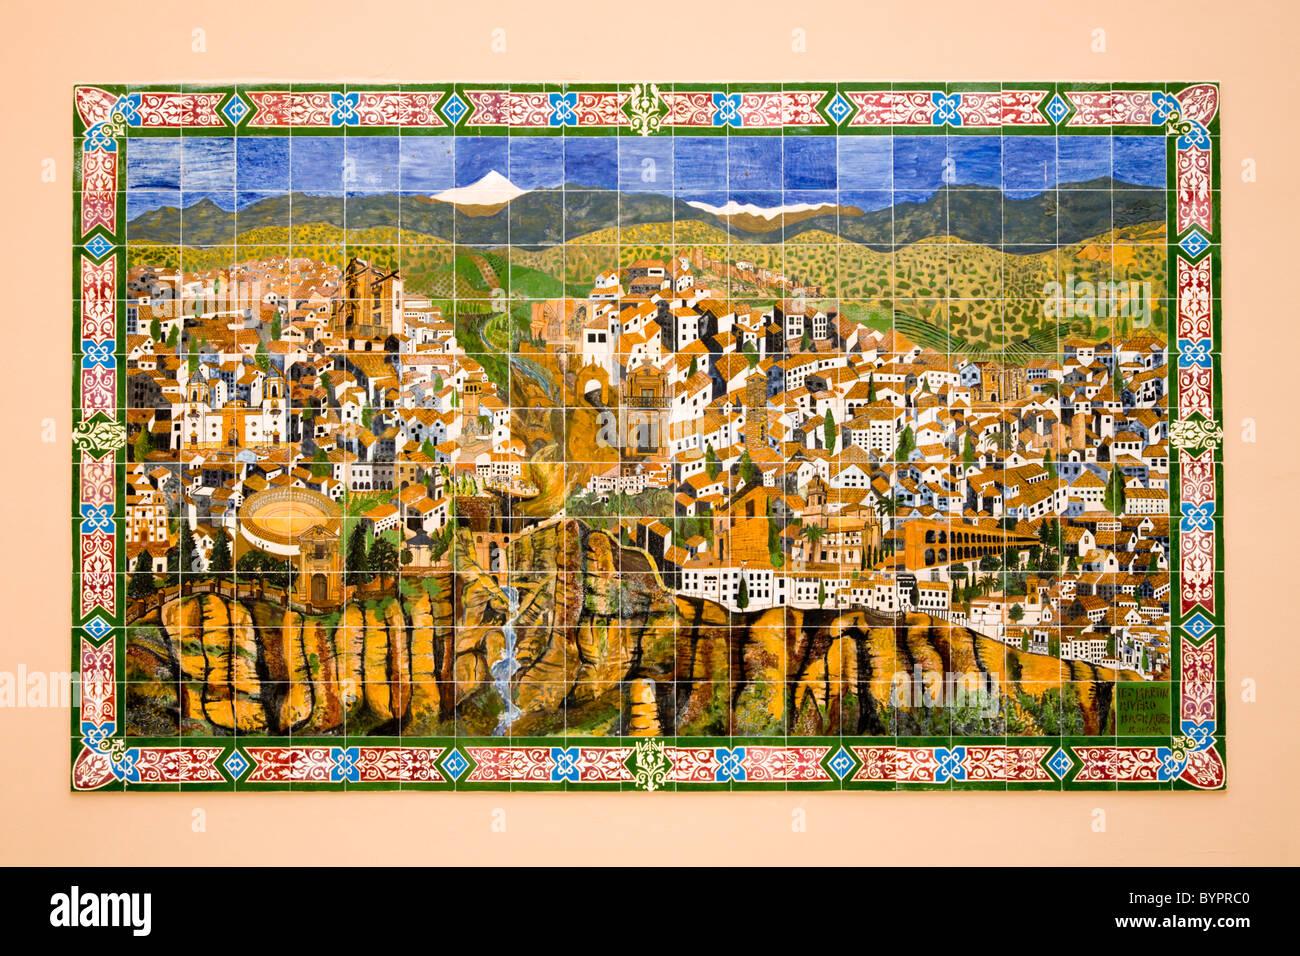 Spanish terracotta terra cotta tile tiles ceramics ceramic spanish terracotta terra cotta tile tiles ceramics ceramic map of ronda city on a wall in ronda spain dailygadgetfo Image collections